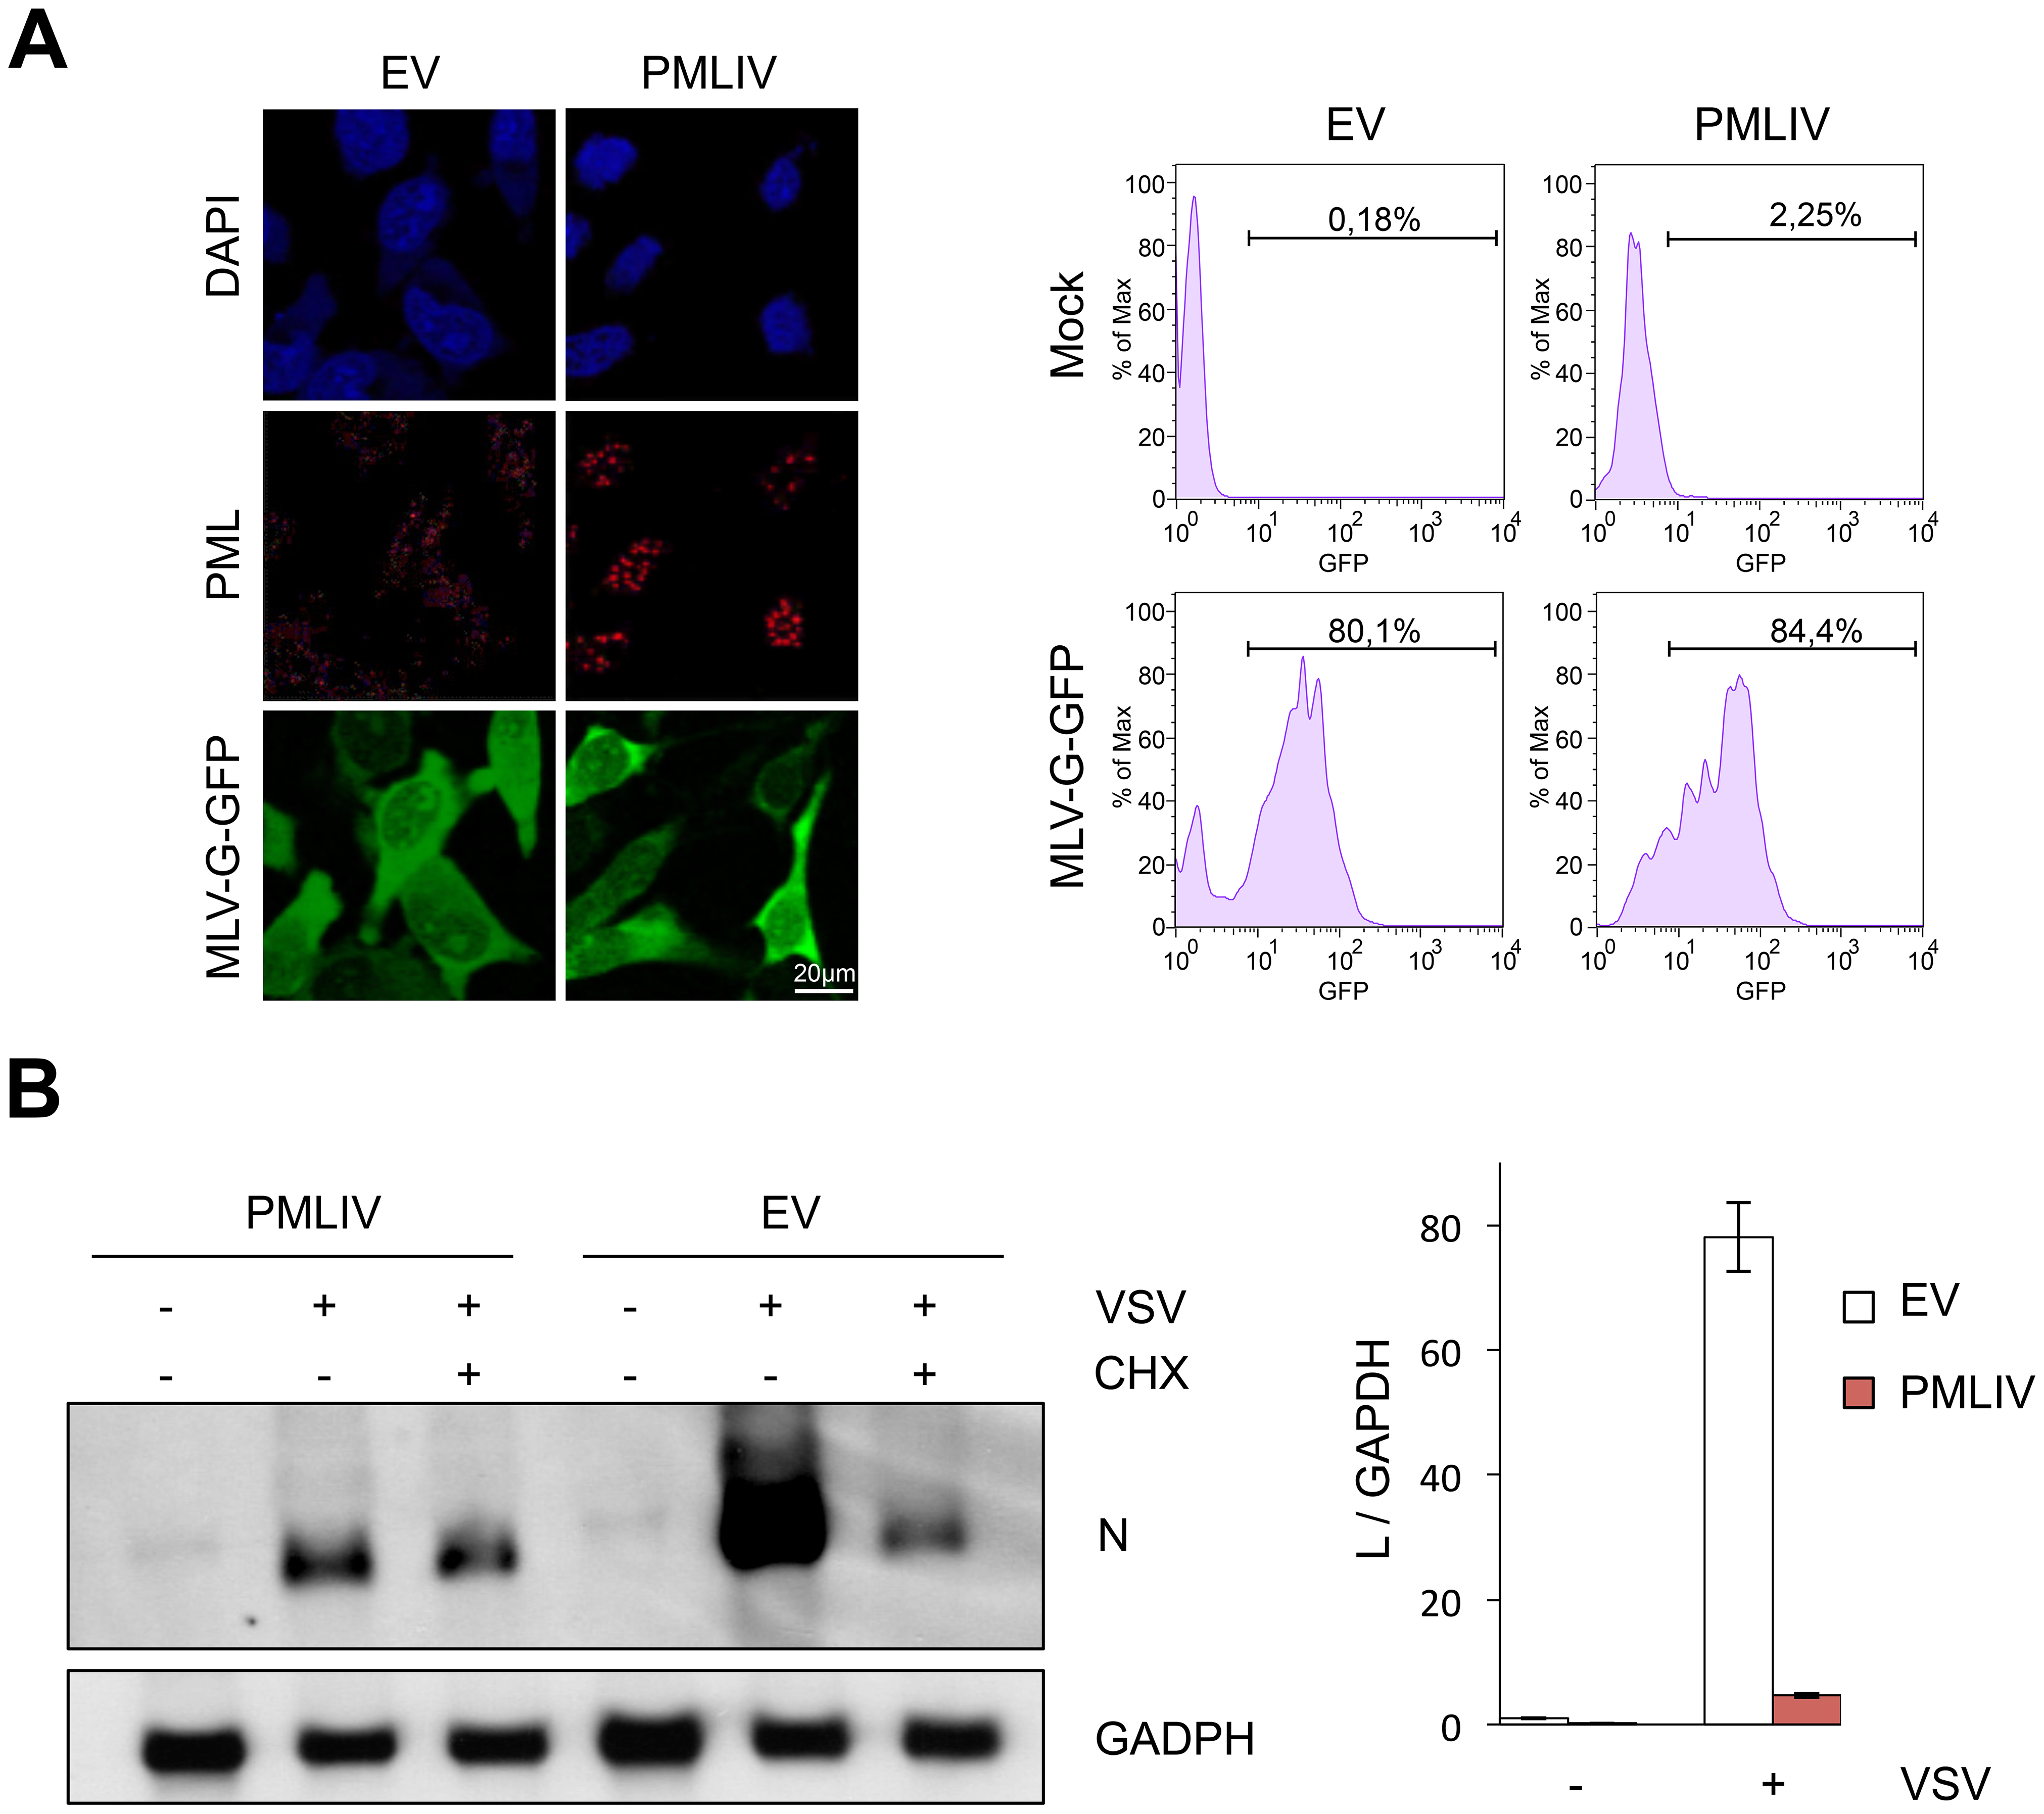 PMLIV does not alter VSV entry and inhibits viral transcription.